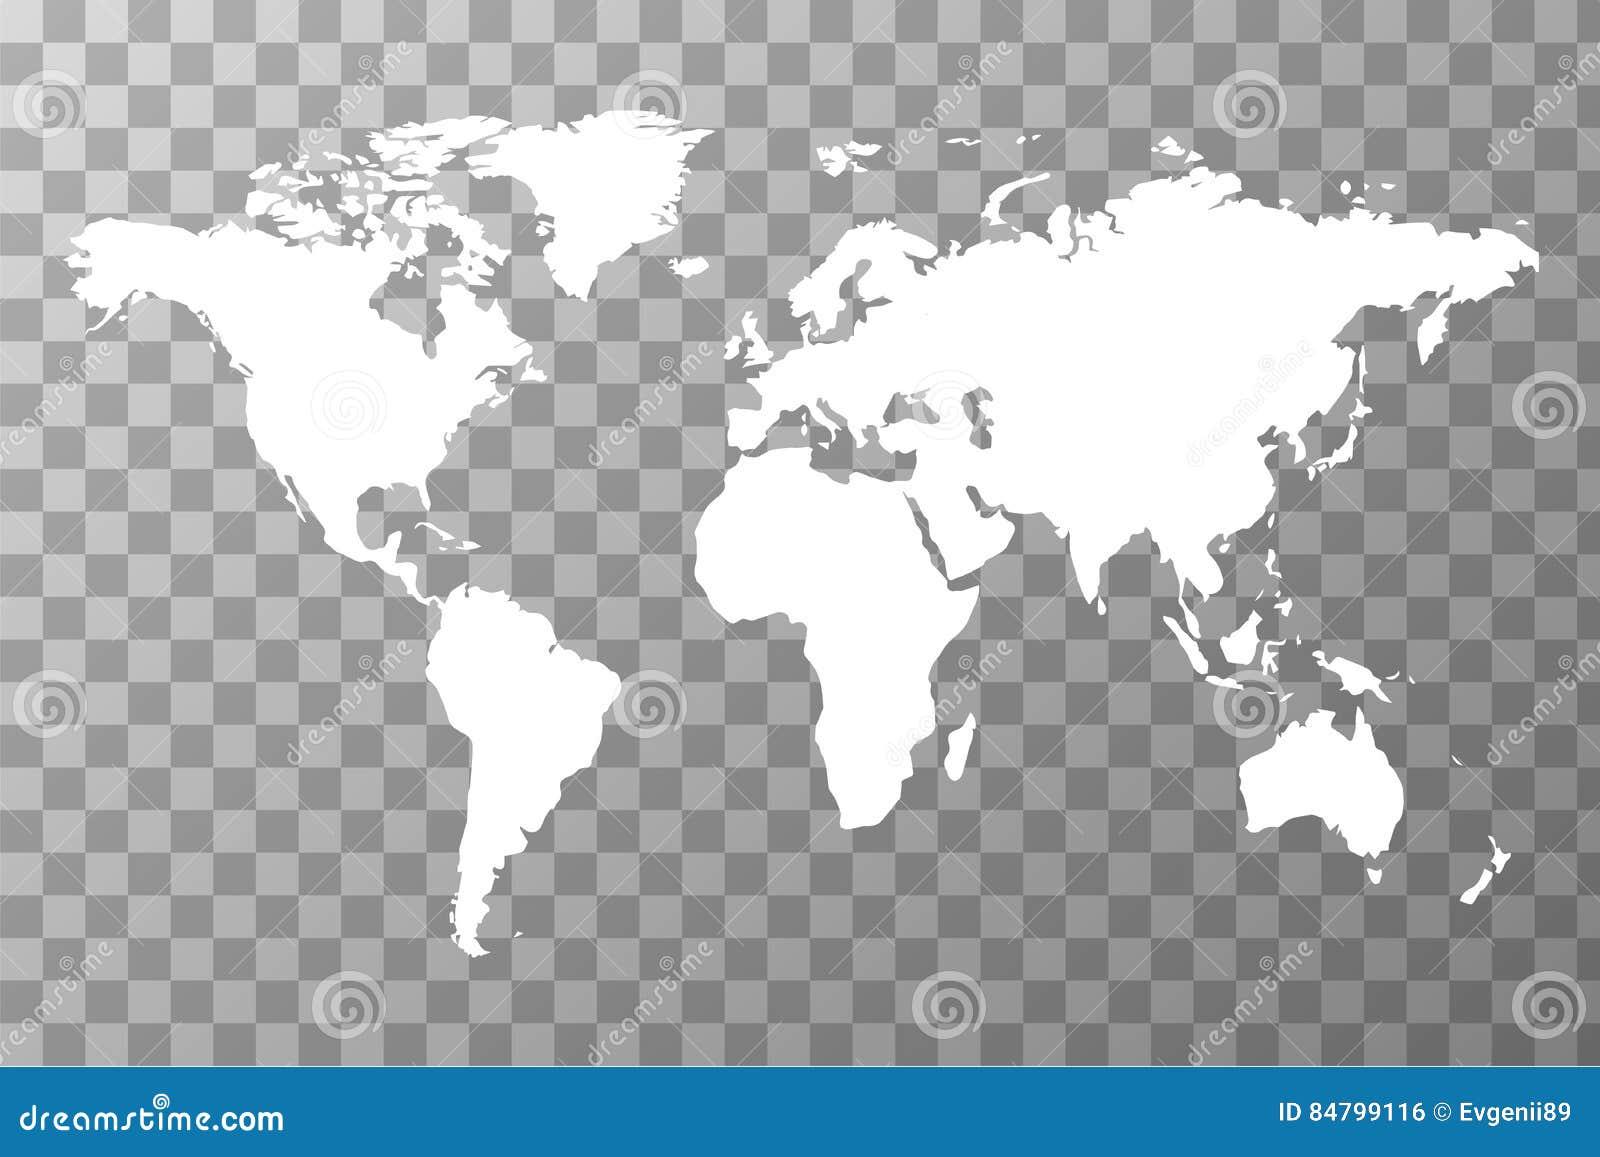 Worldwide Map On Transparent Background Stock Illustration